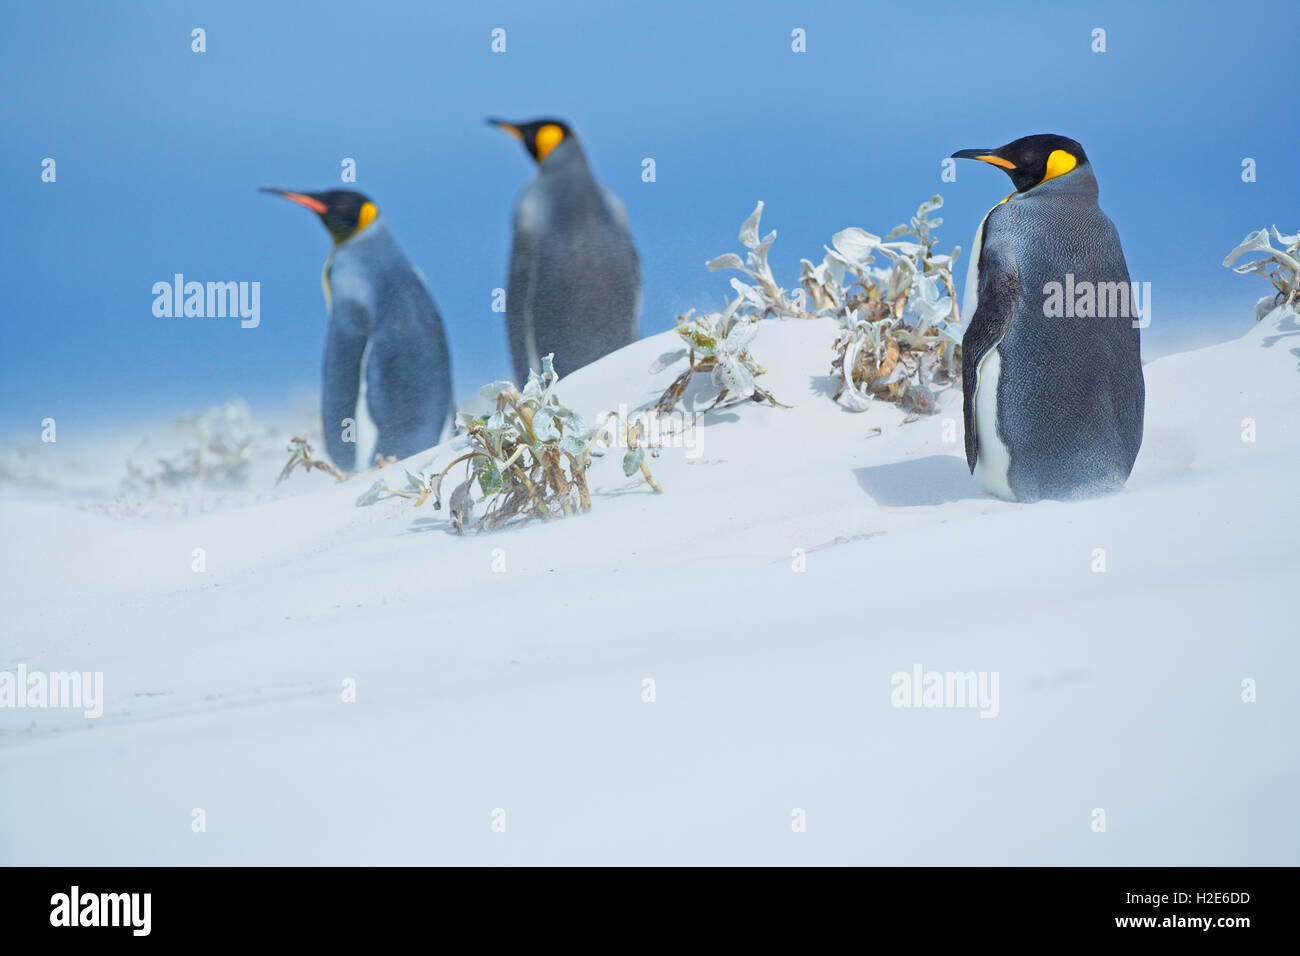 Three king penguins in snow, East Falkland, Falkland Islands, South Atlantic - Stock Image